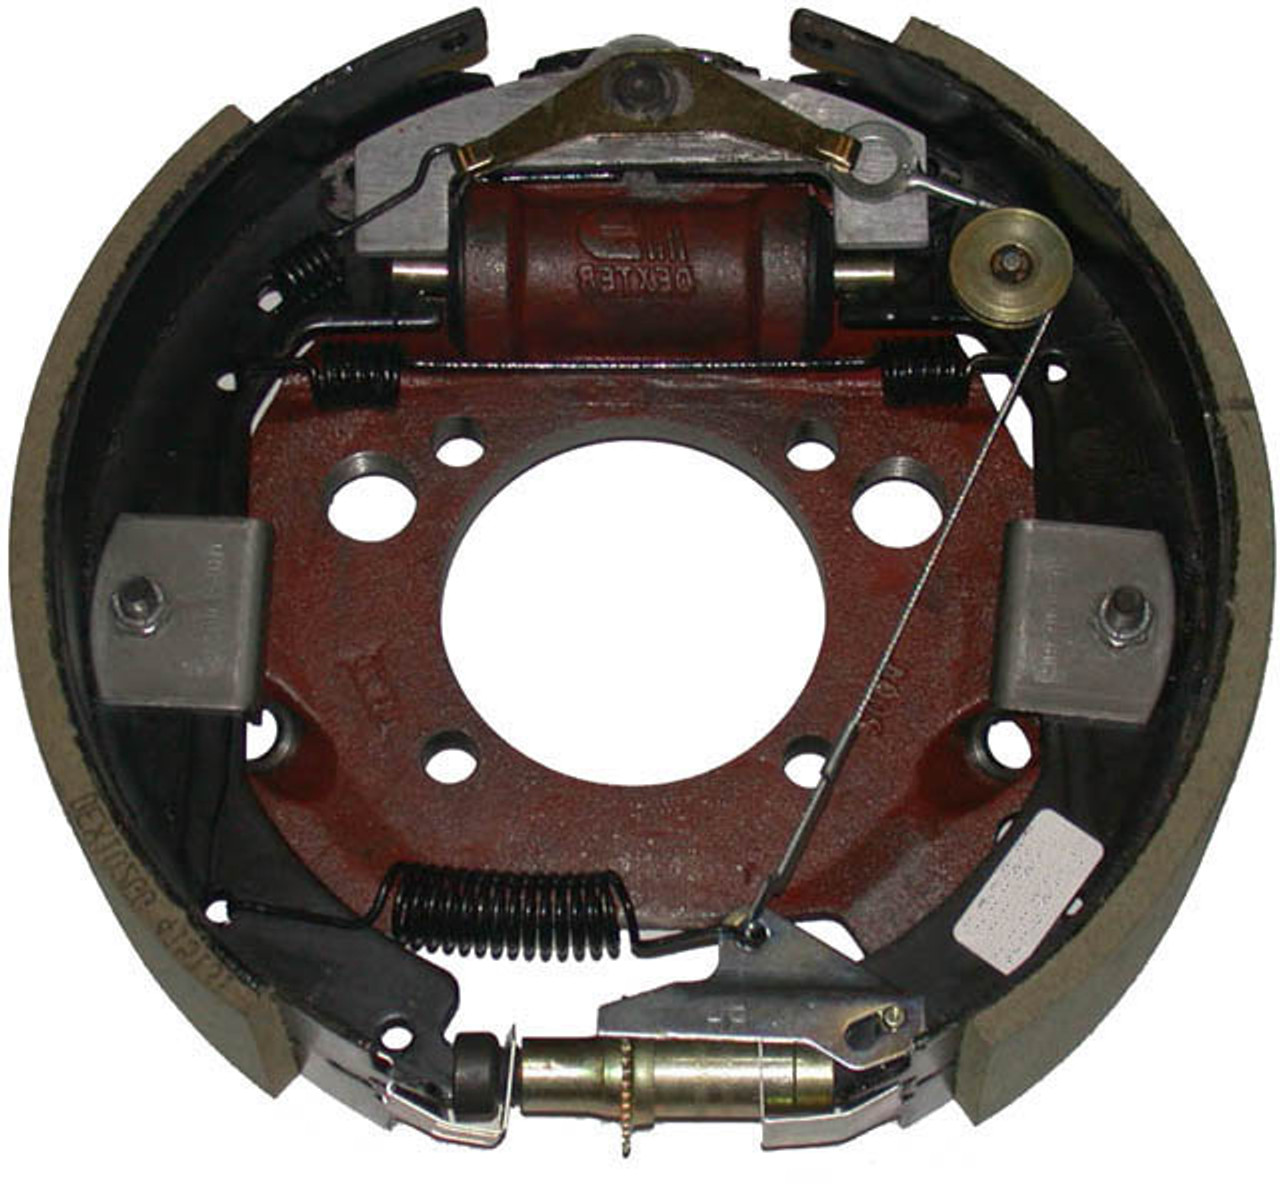 "23-138 --- 12-1/4"" Hydraulic Brake - Left Hand Assembly - 8k"